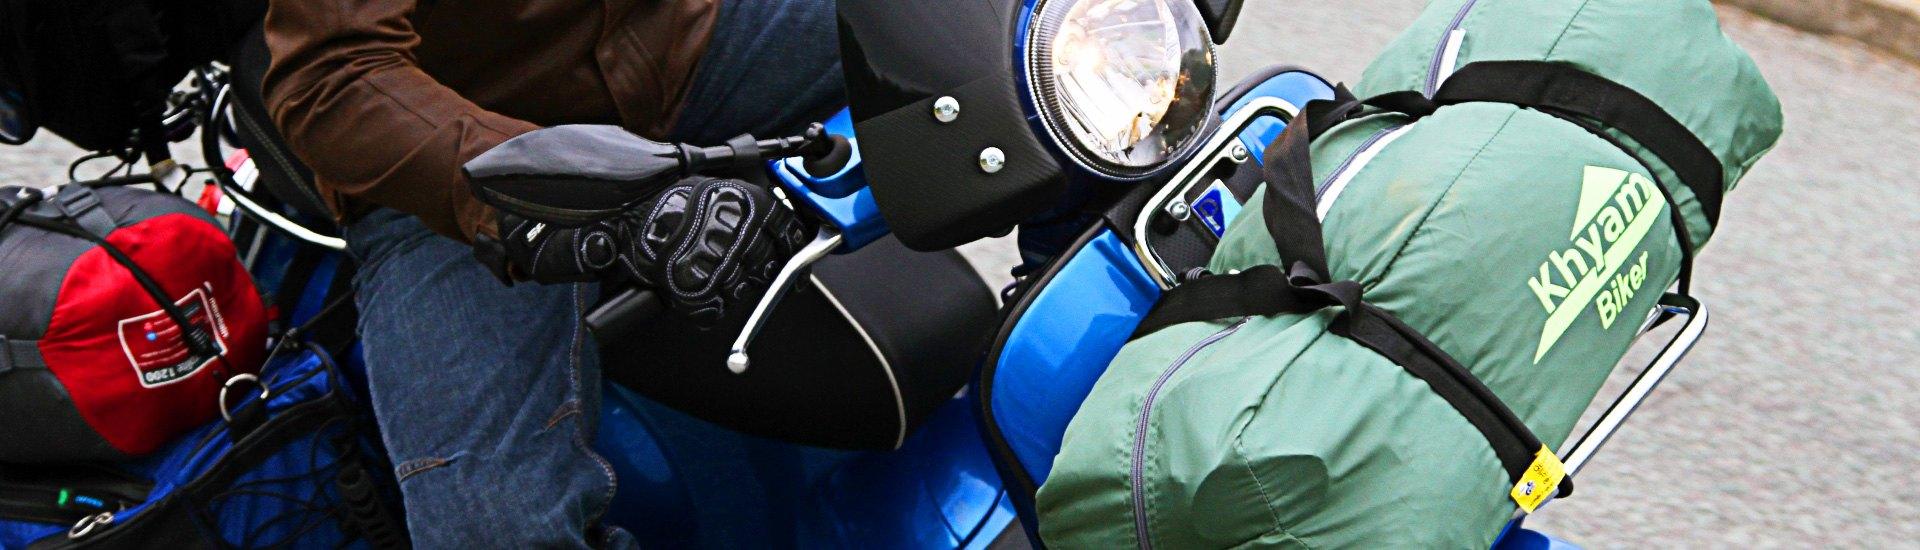 Motorcycle Luggage Systems & Saddlebags